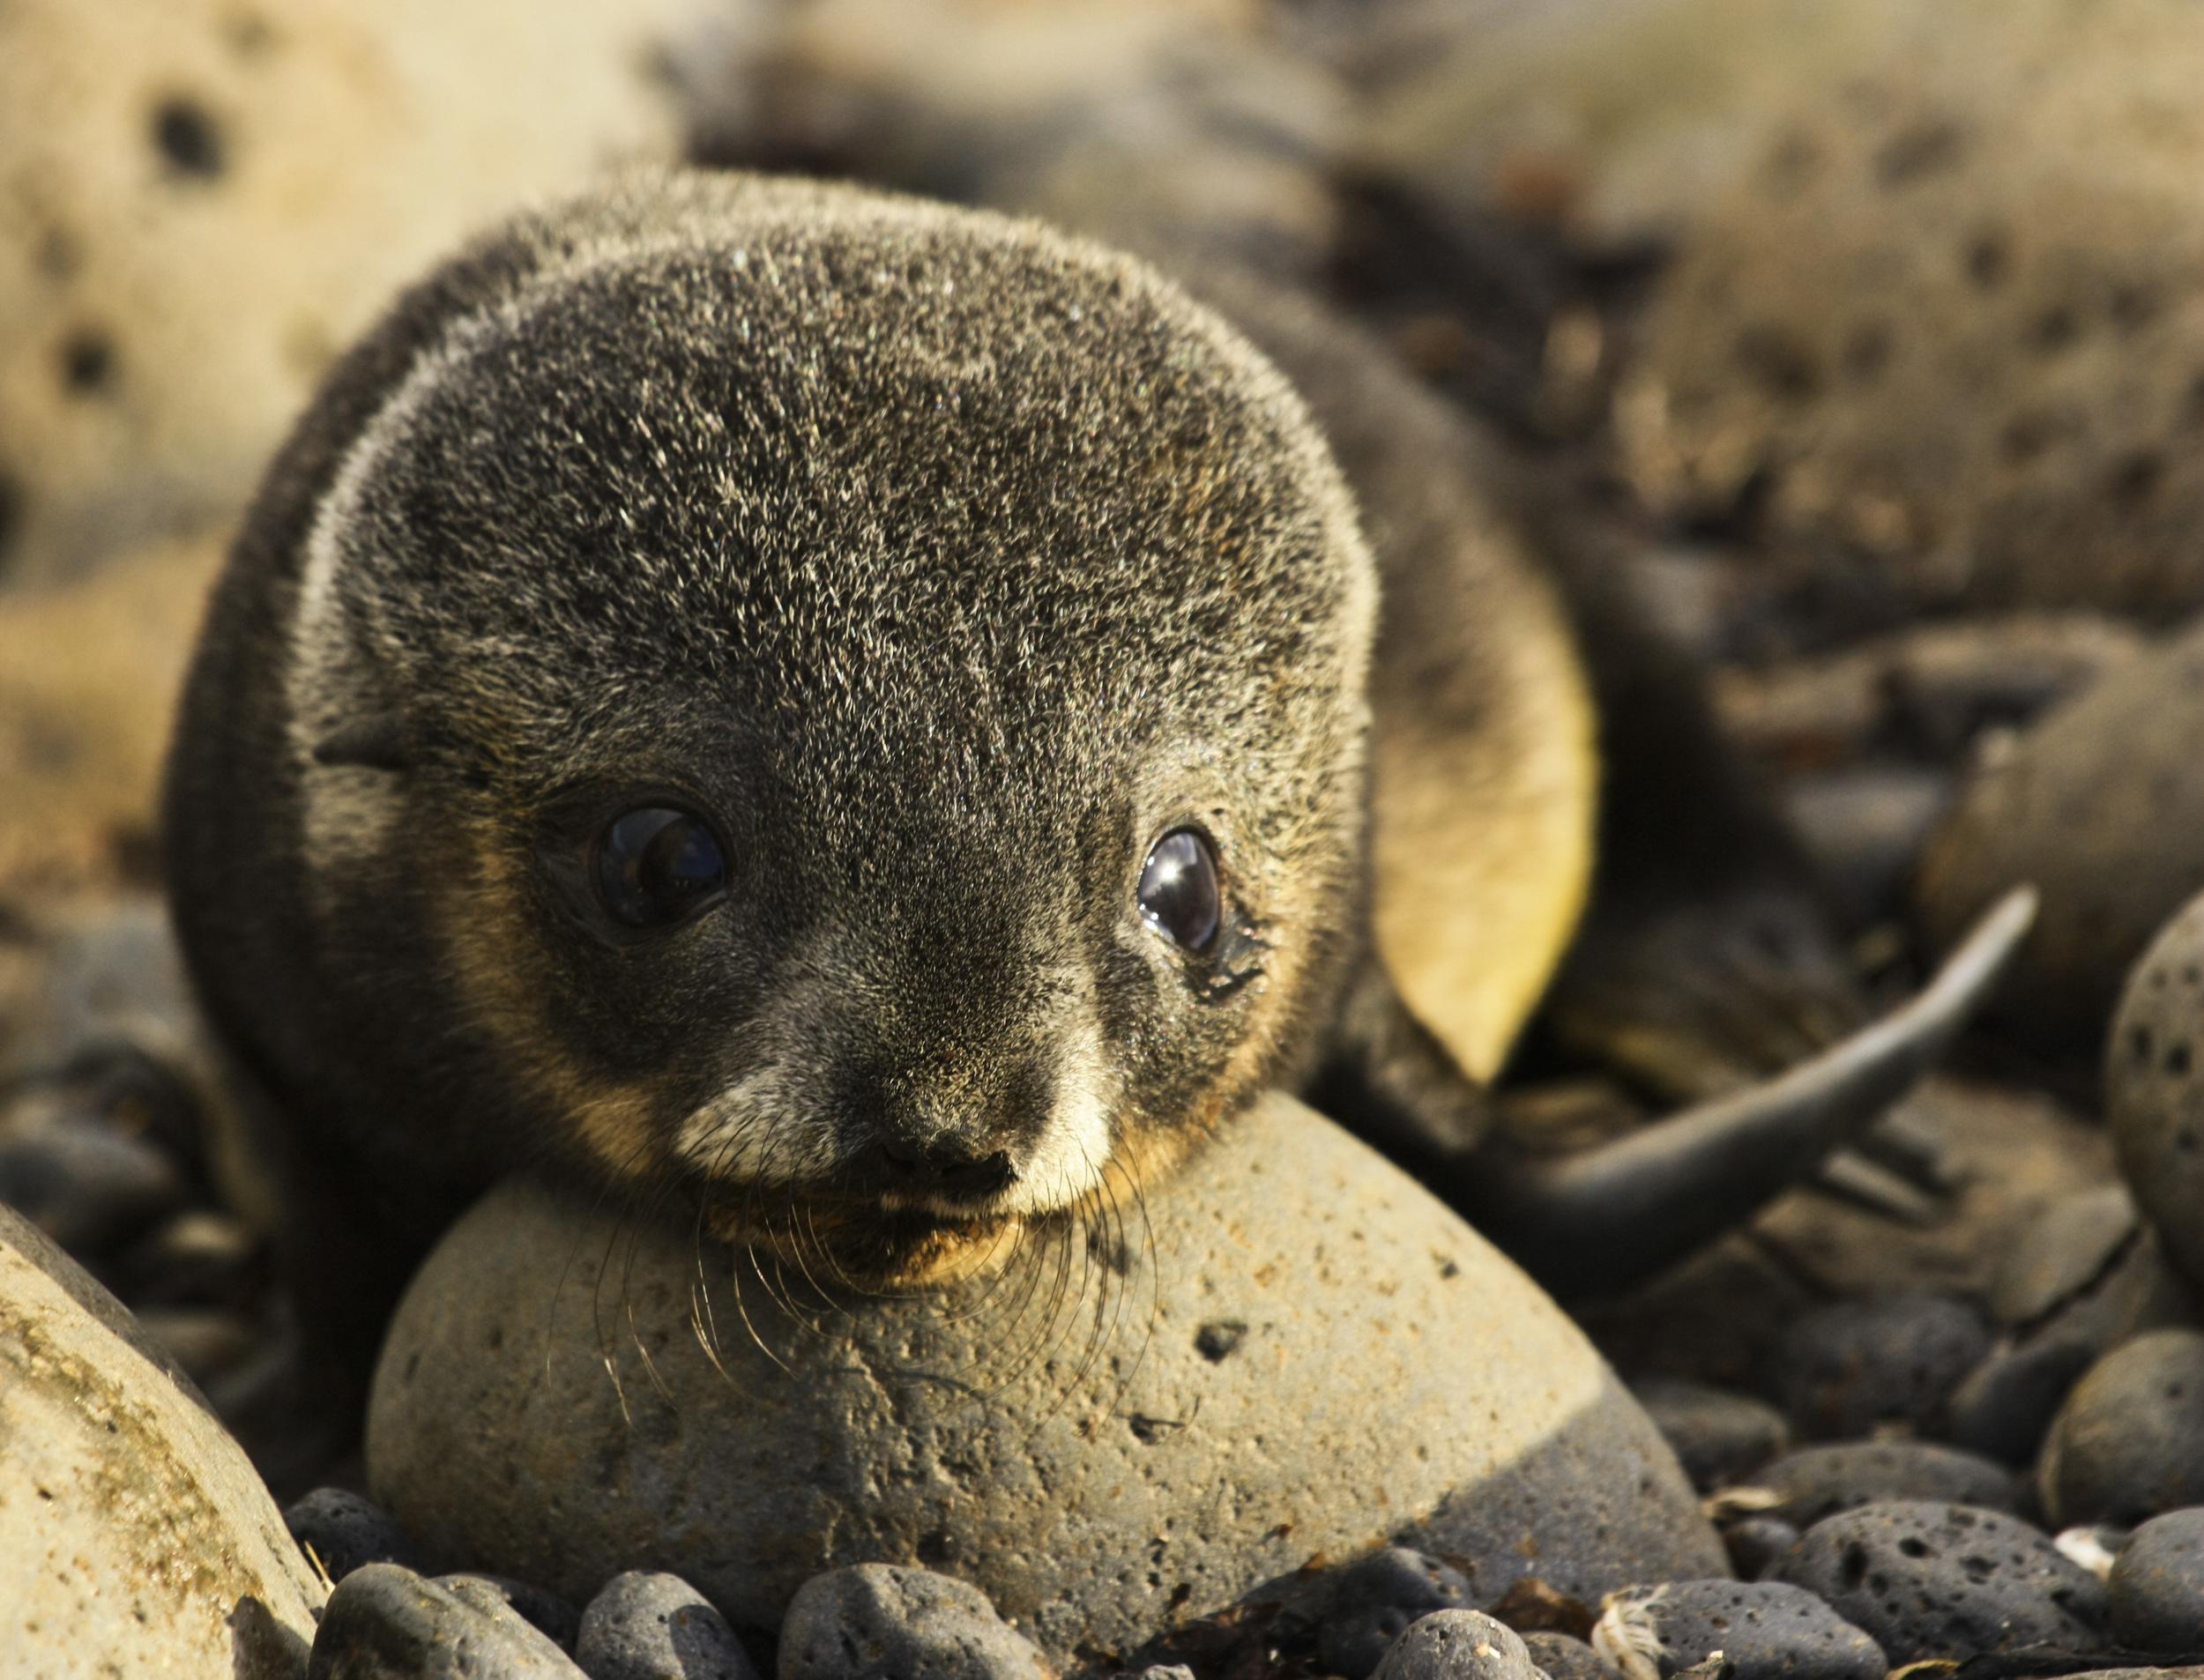 A 30 day old Antarctic fur seal pup